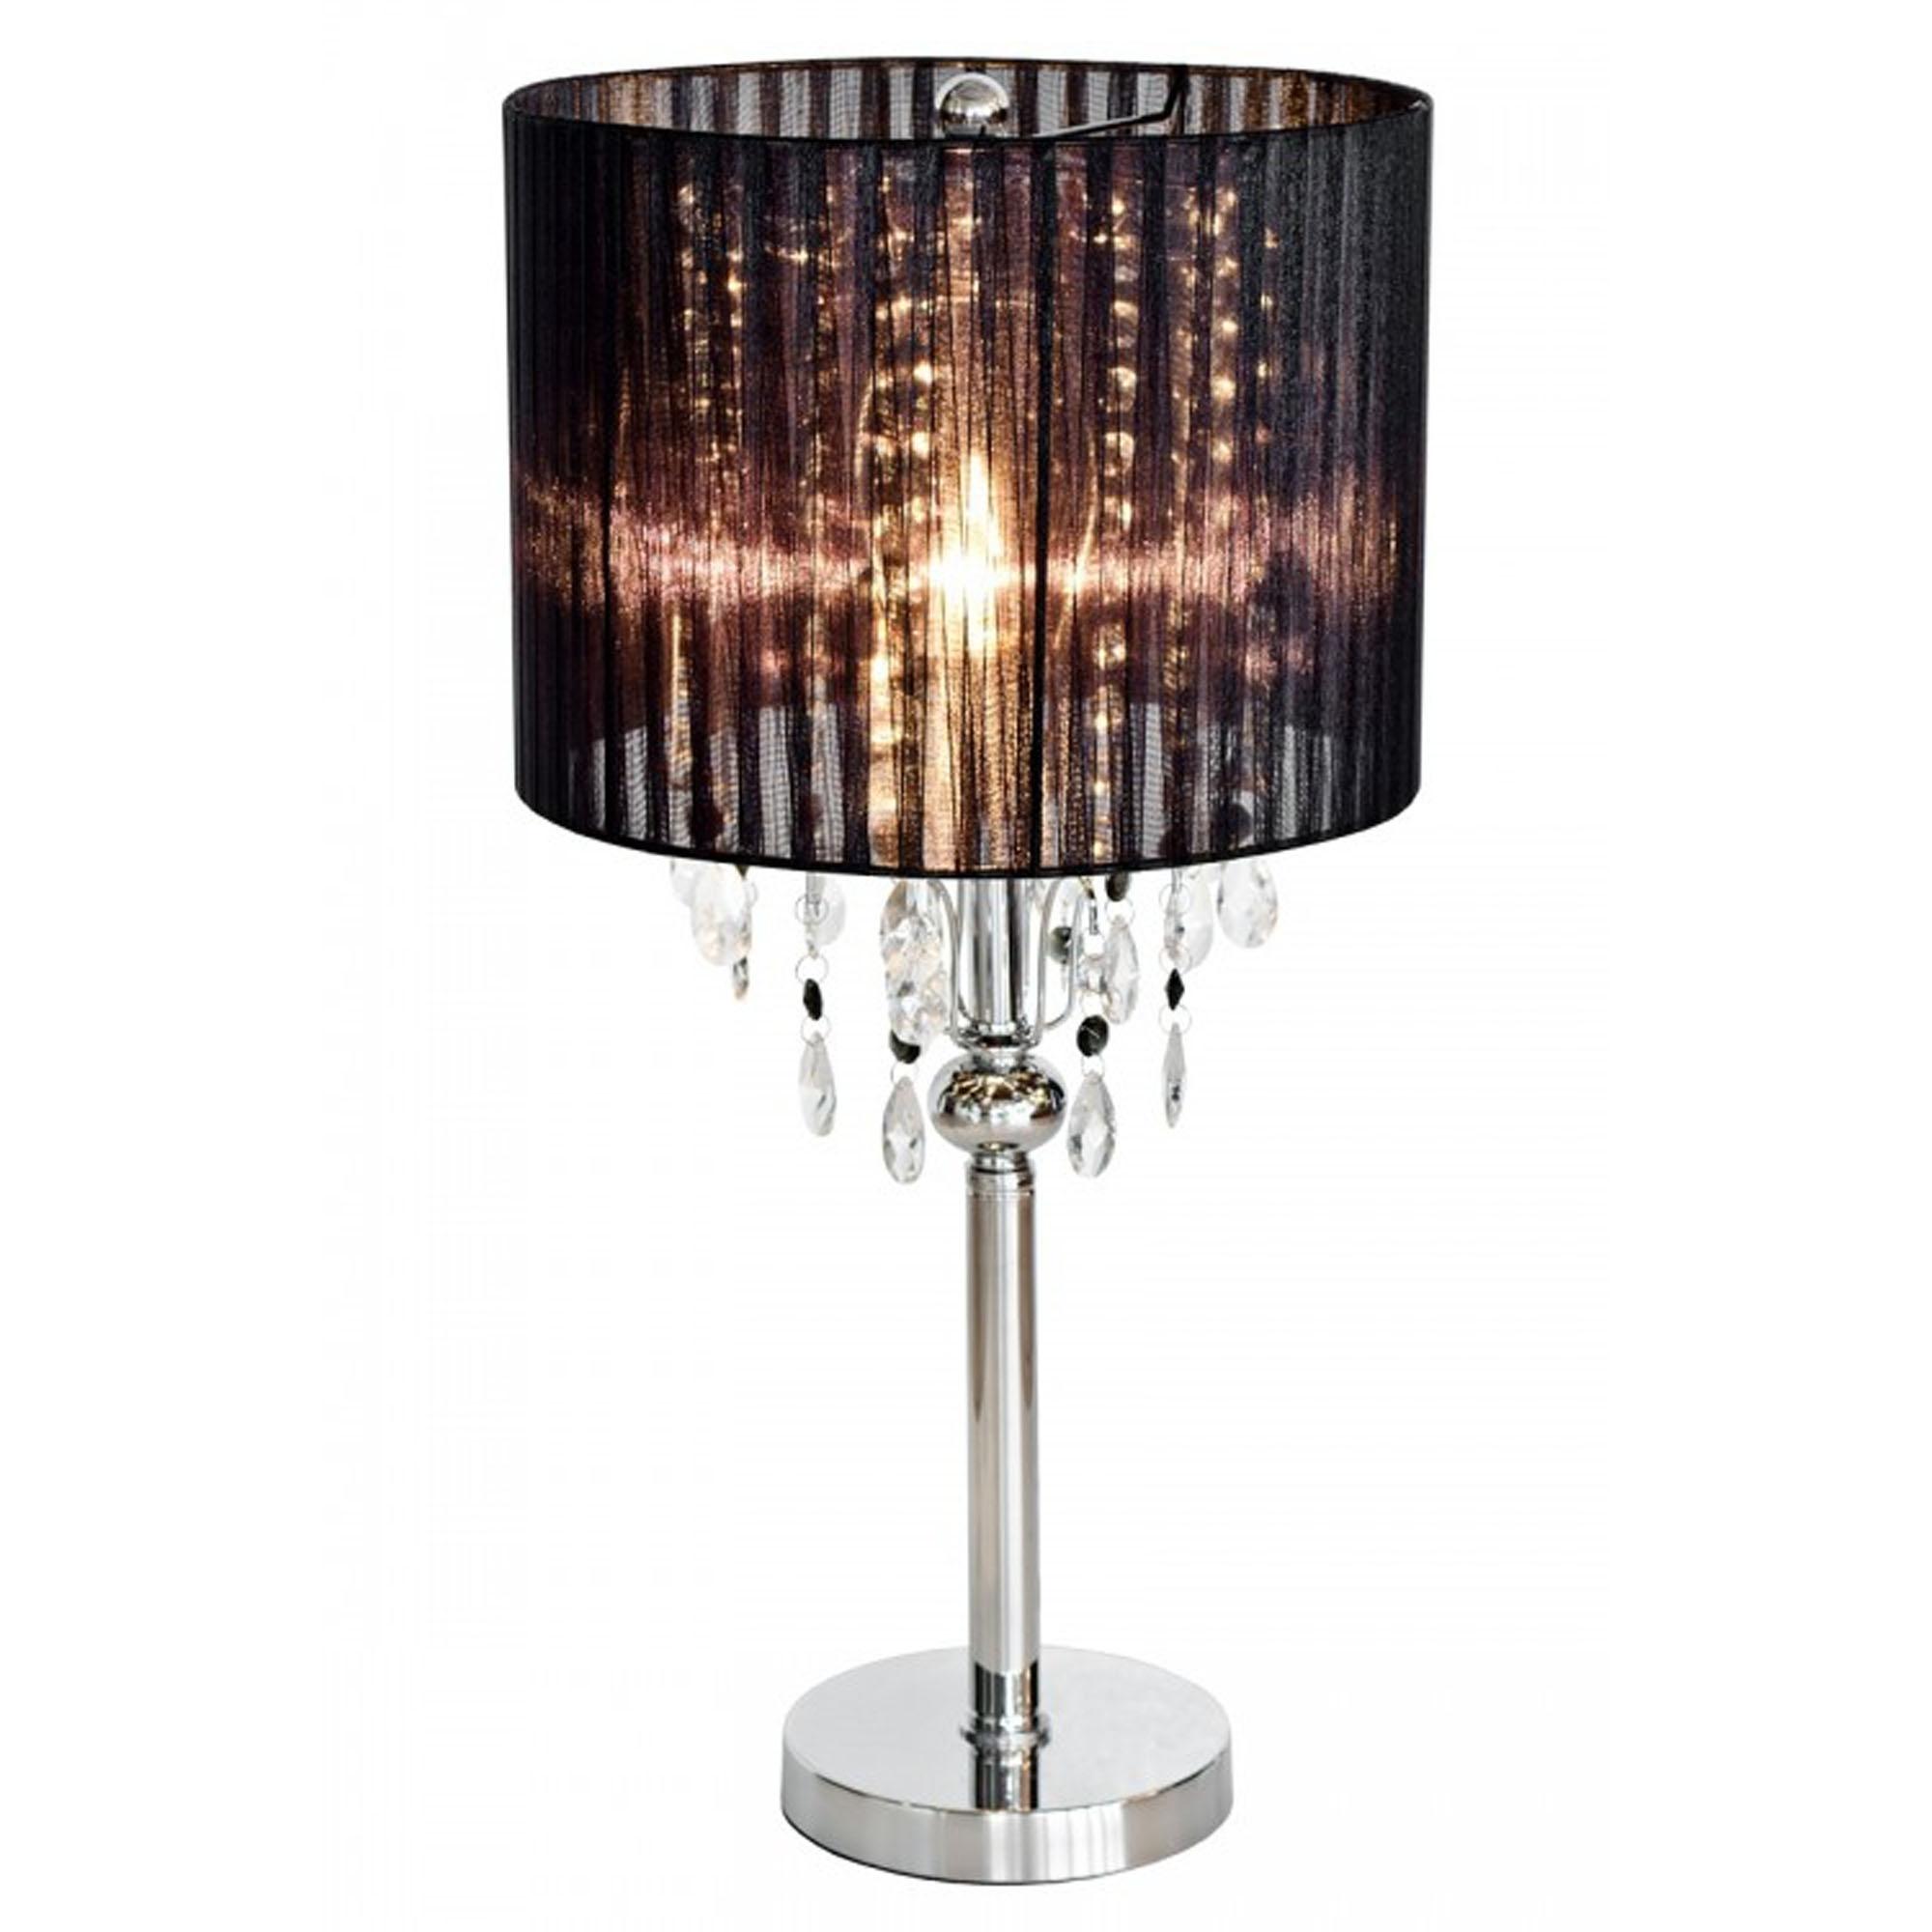 Spencer Bedside Table Lamp Tables Lamps, Bedside Table Chandelier Lamps